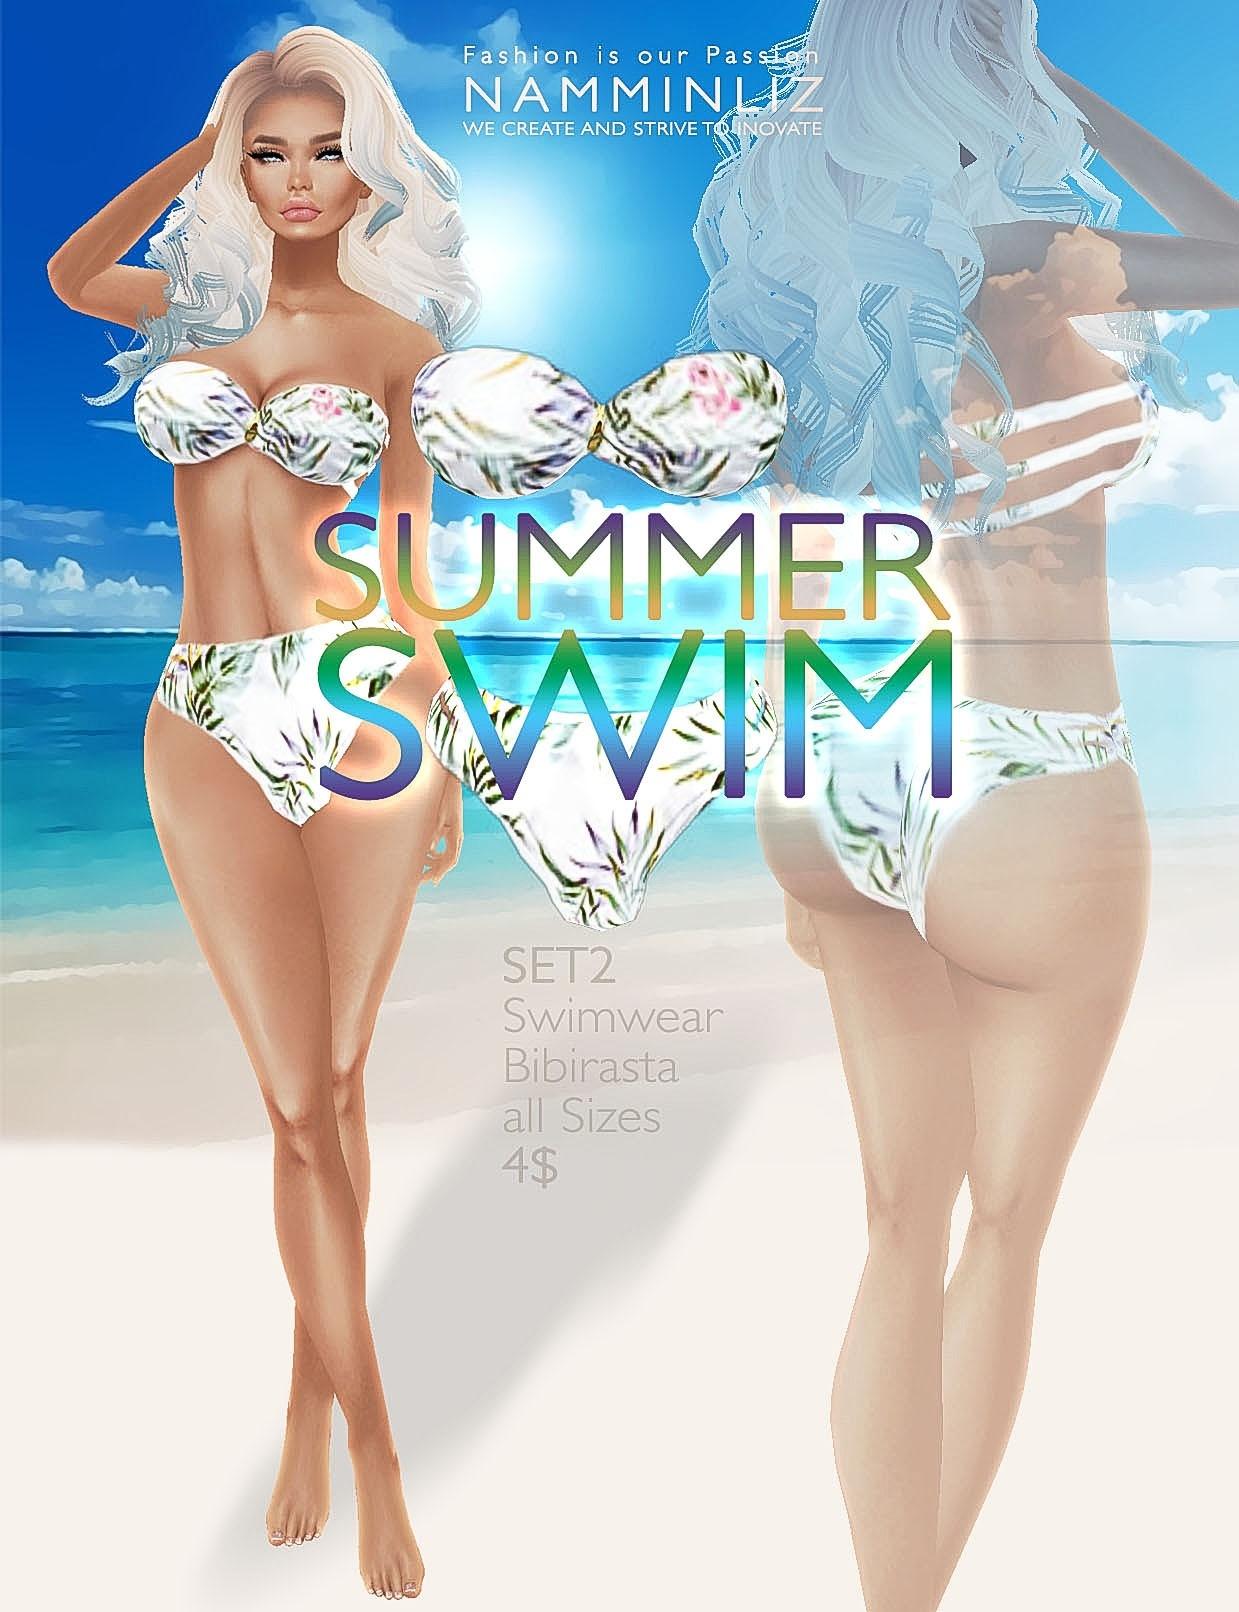 Summer swim SET2 imvu Bibirasta all sizes swimwear texture file sale